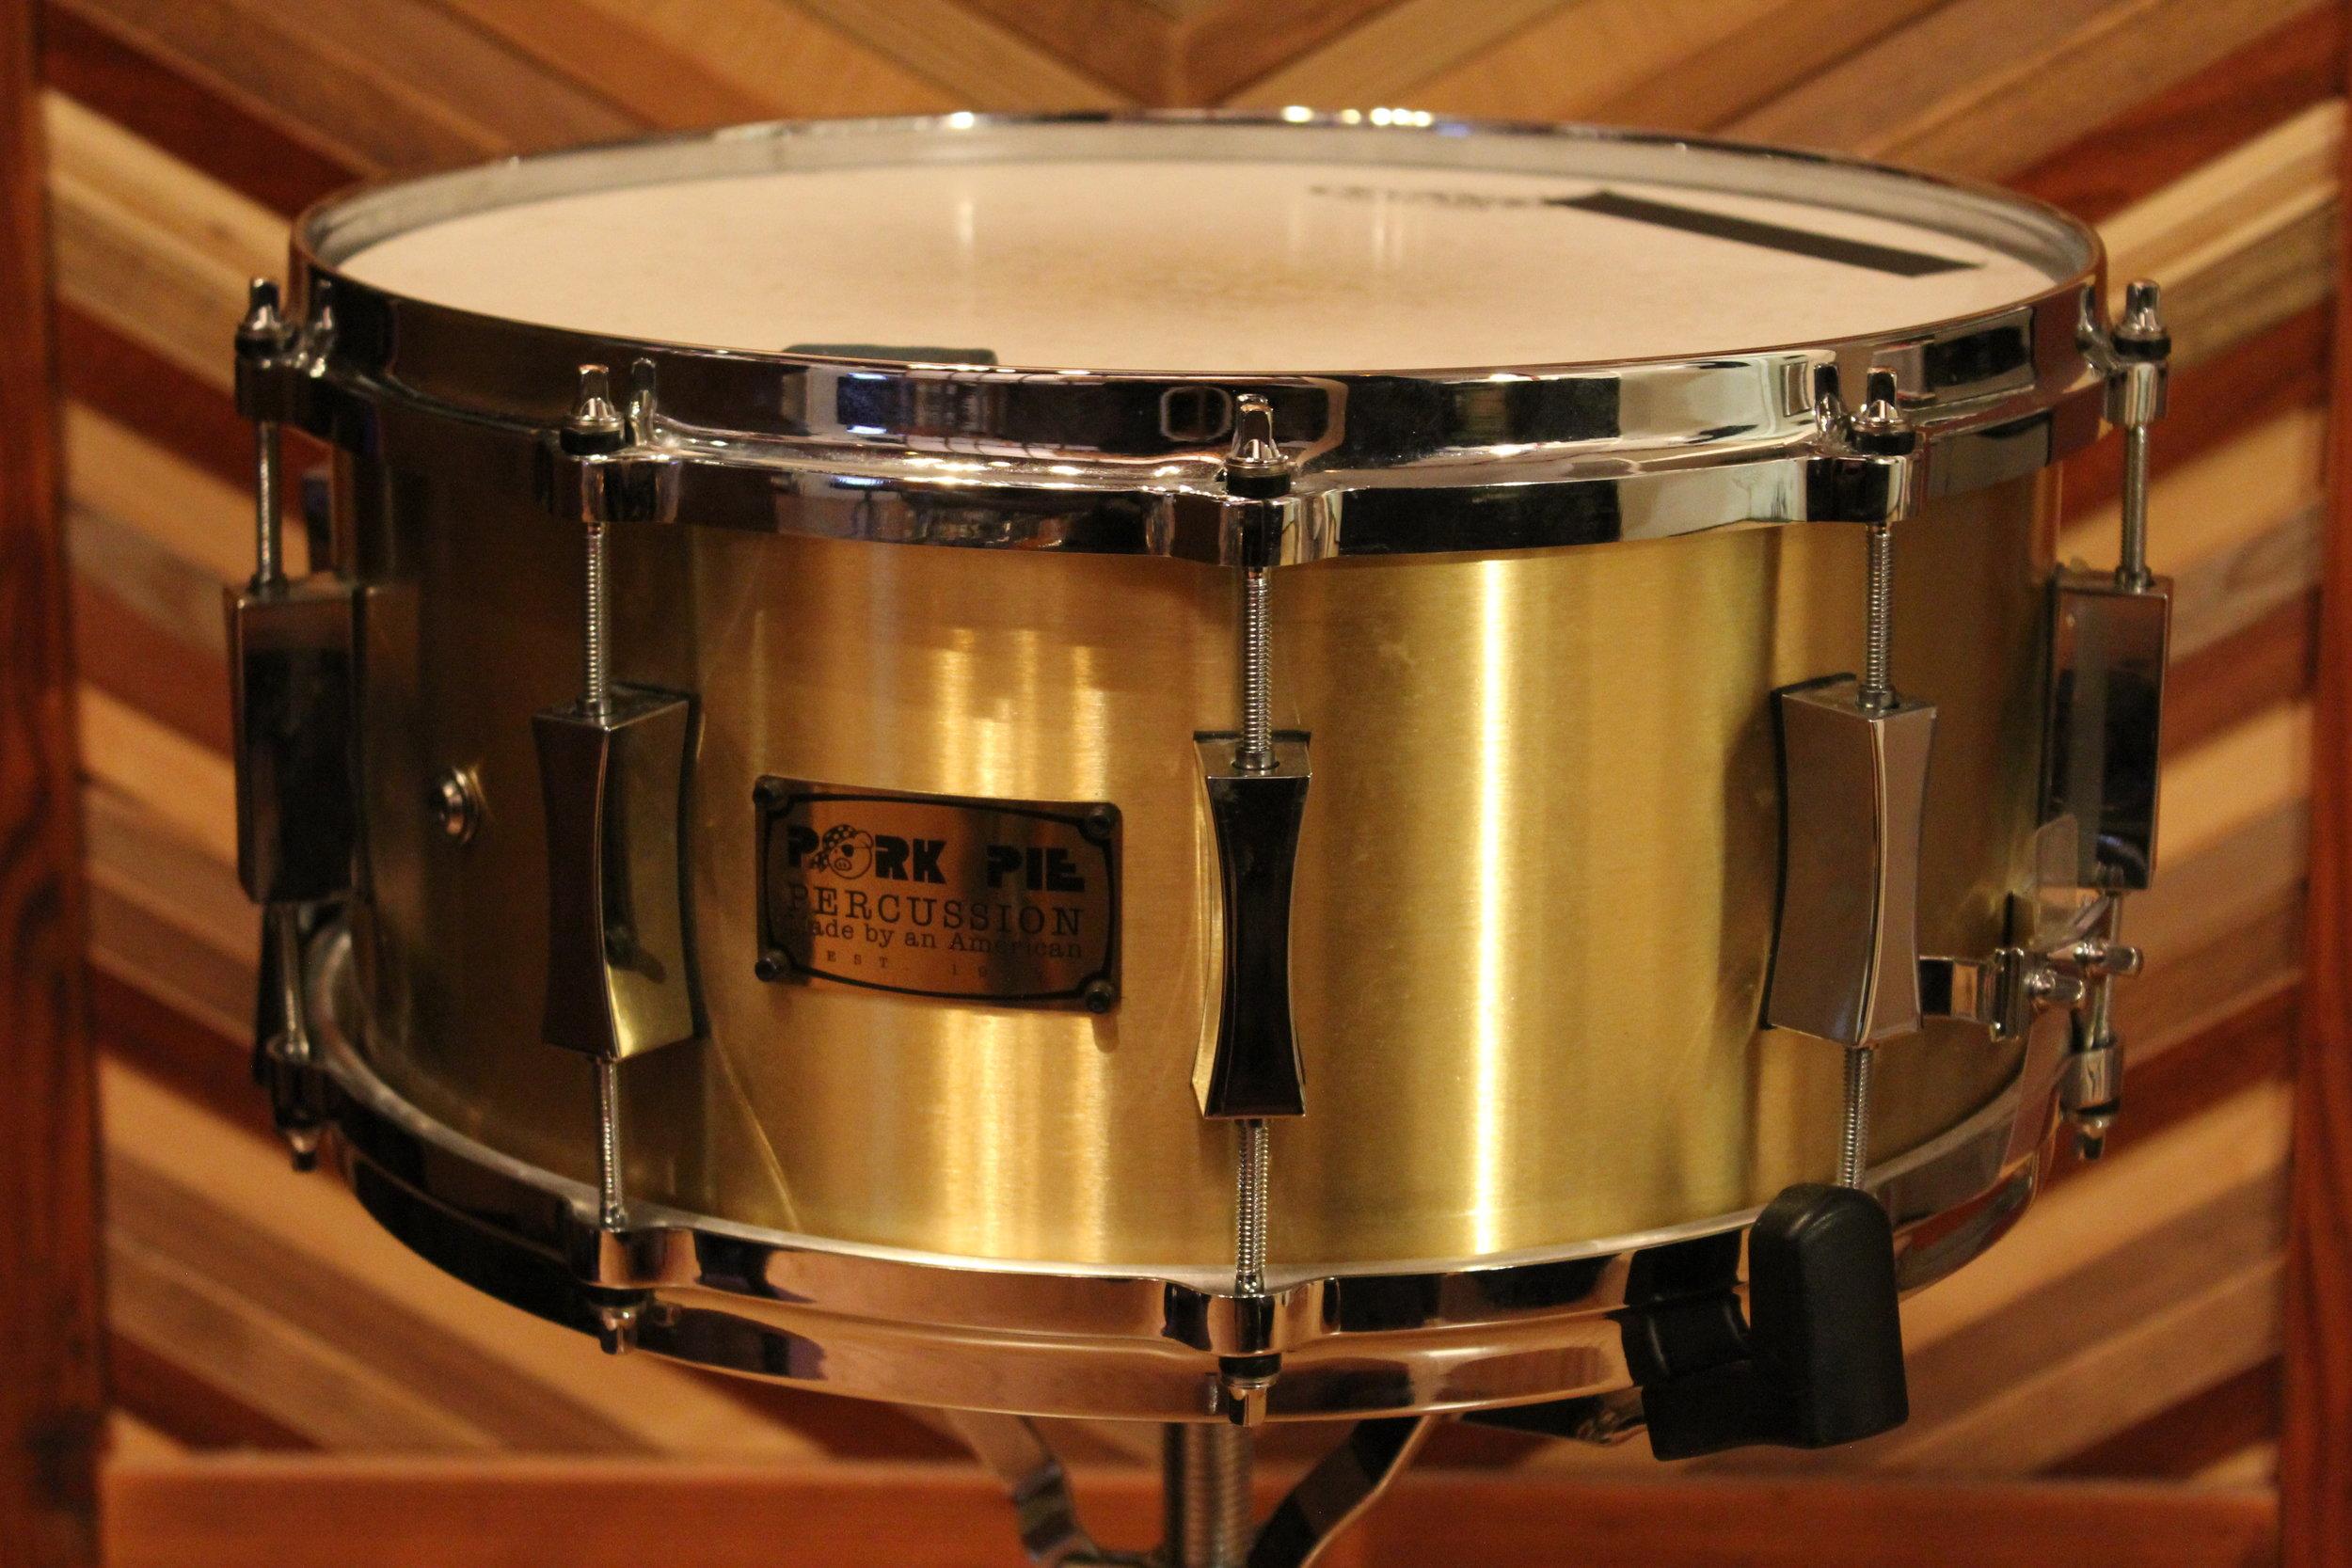 Pork Pie Percussion - Bell Brass